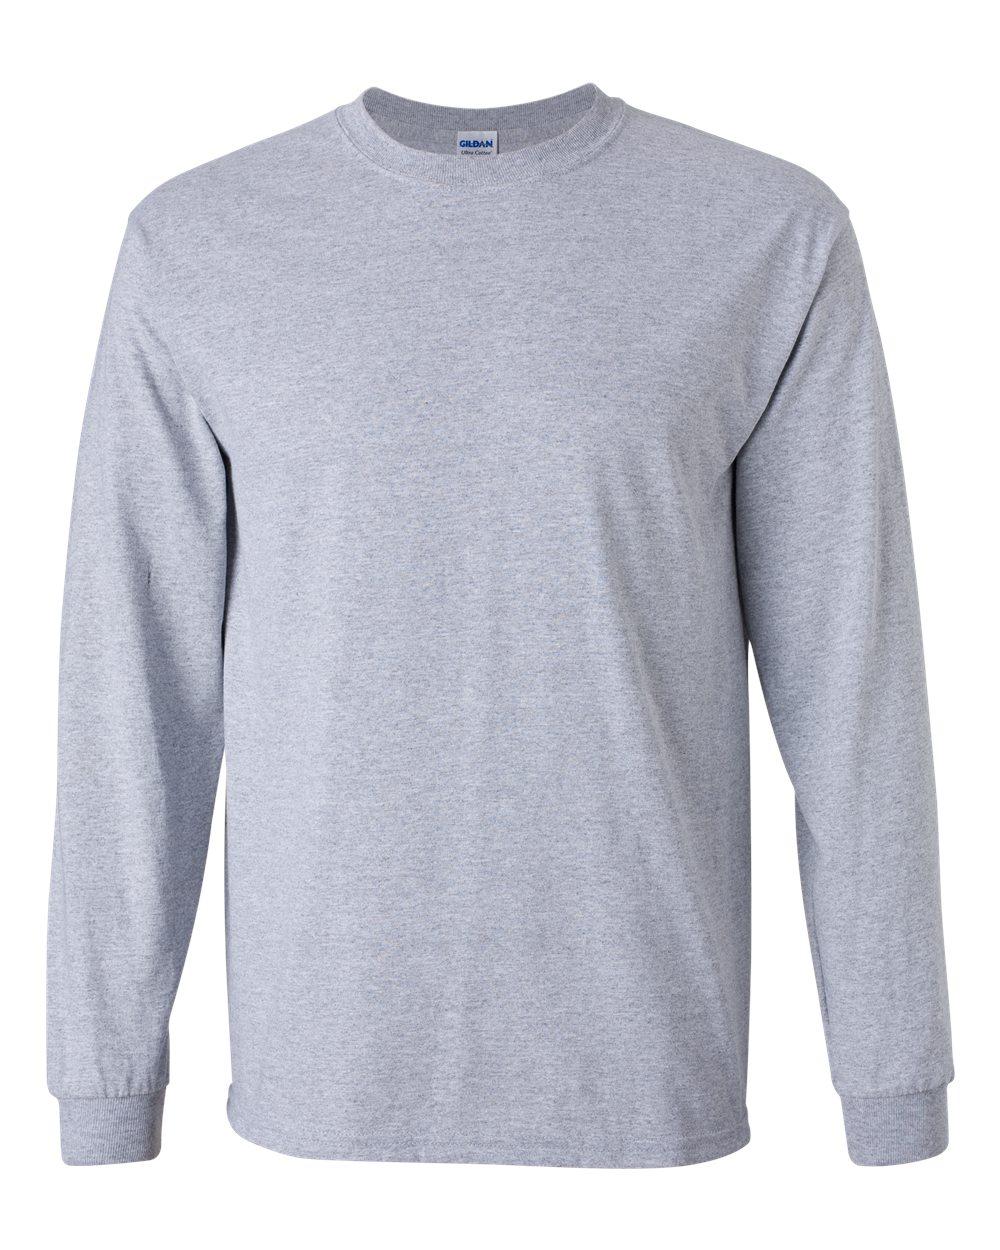 Men s Basic Plain Long Sleeve Shirt  GREY (Small)  cc50fc482c2